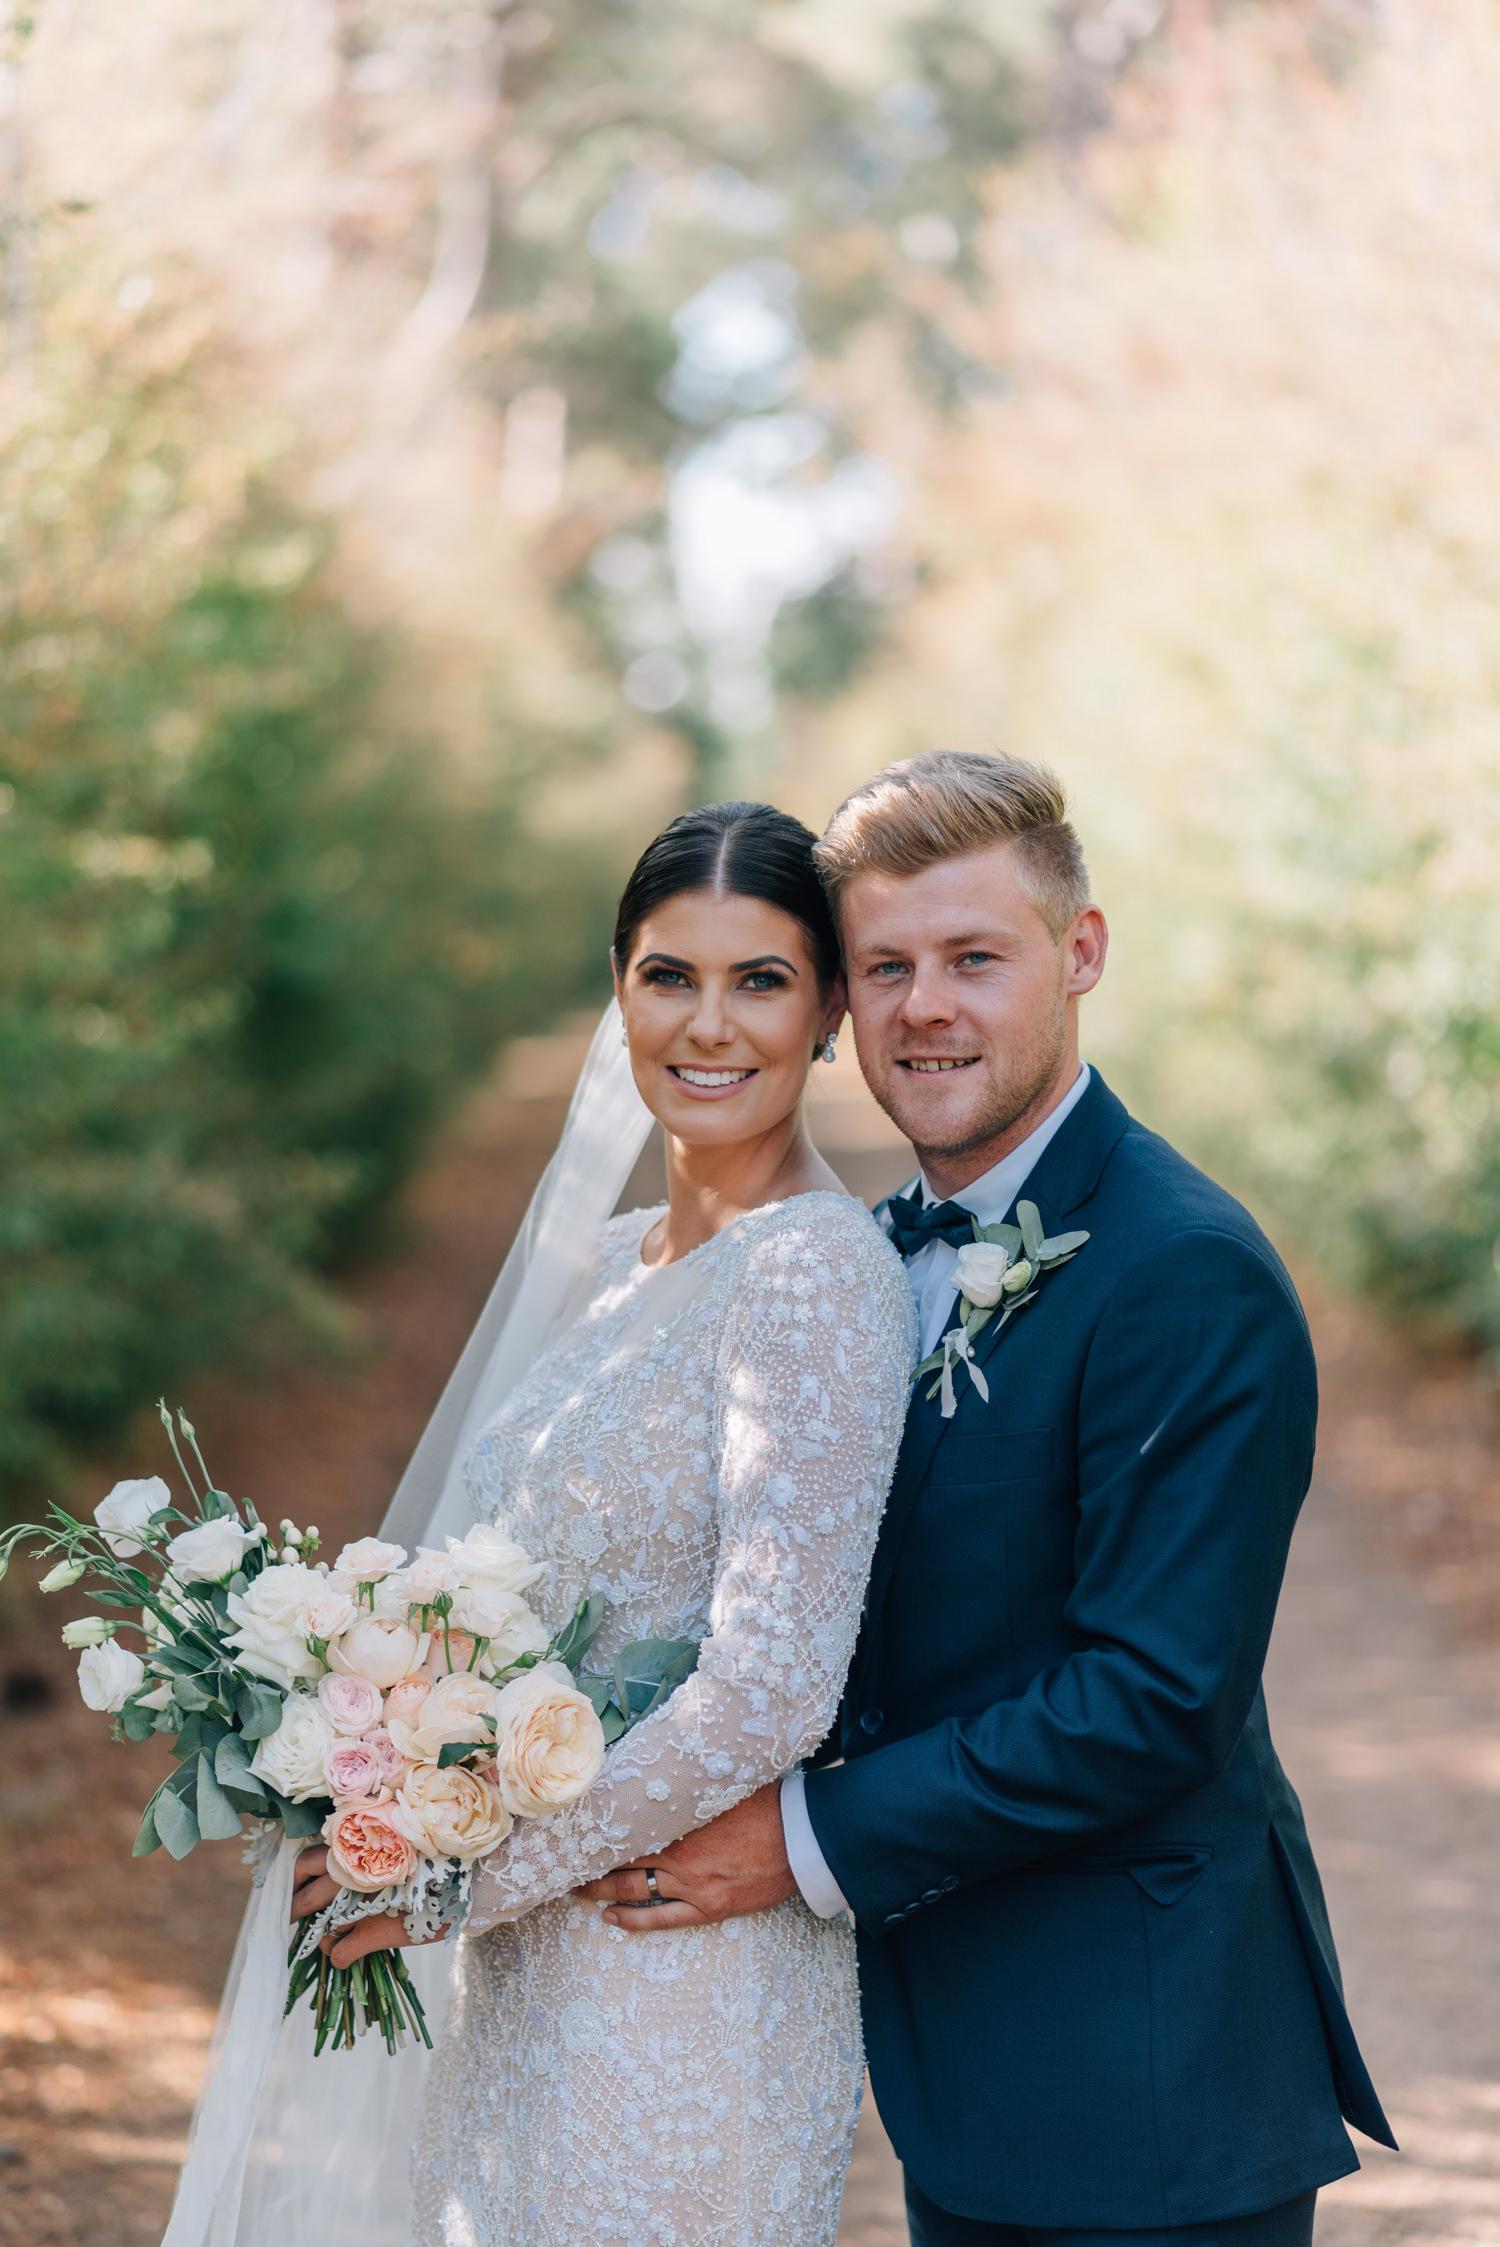 Quamby-Wedding-Photography-84.jpg